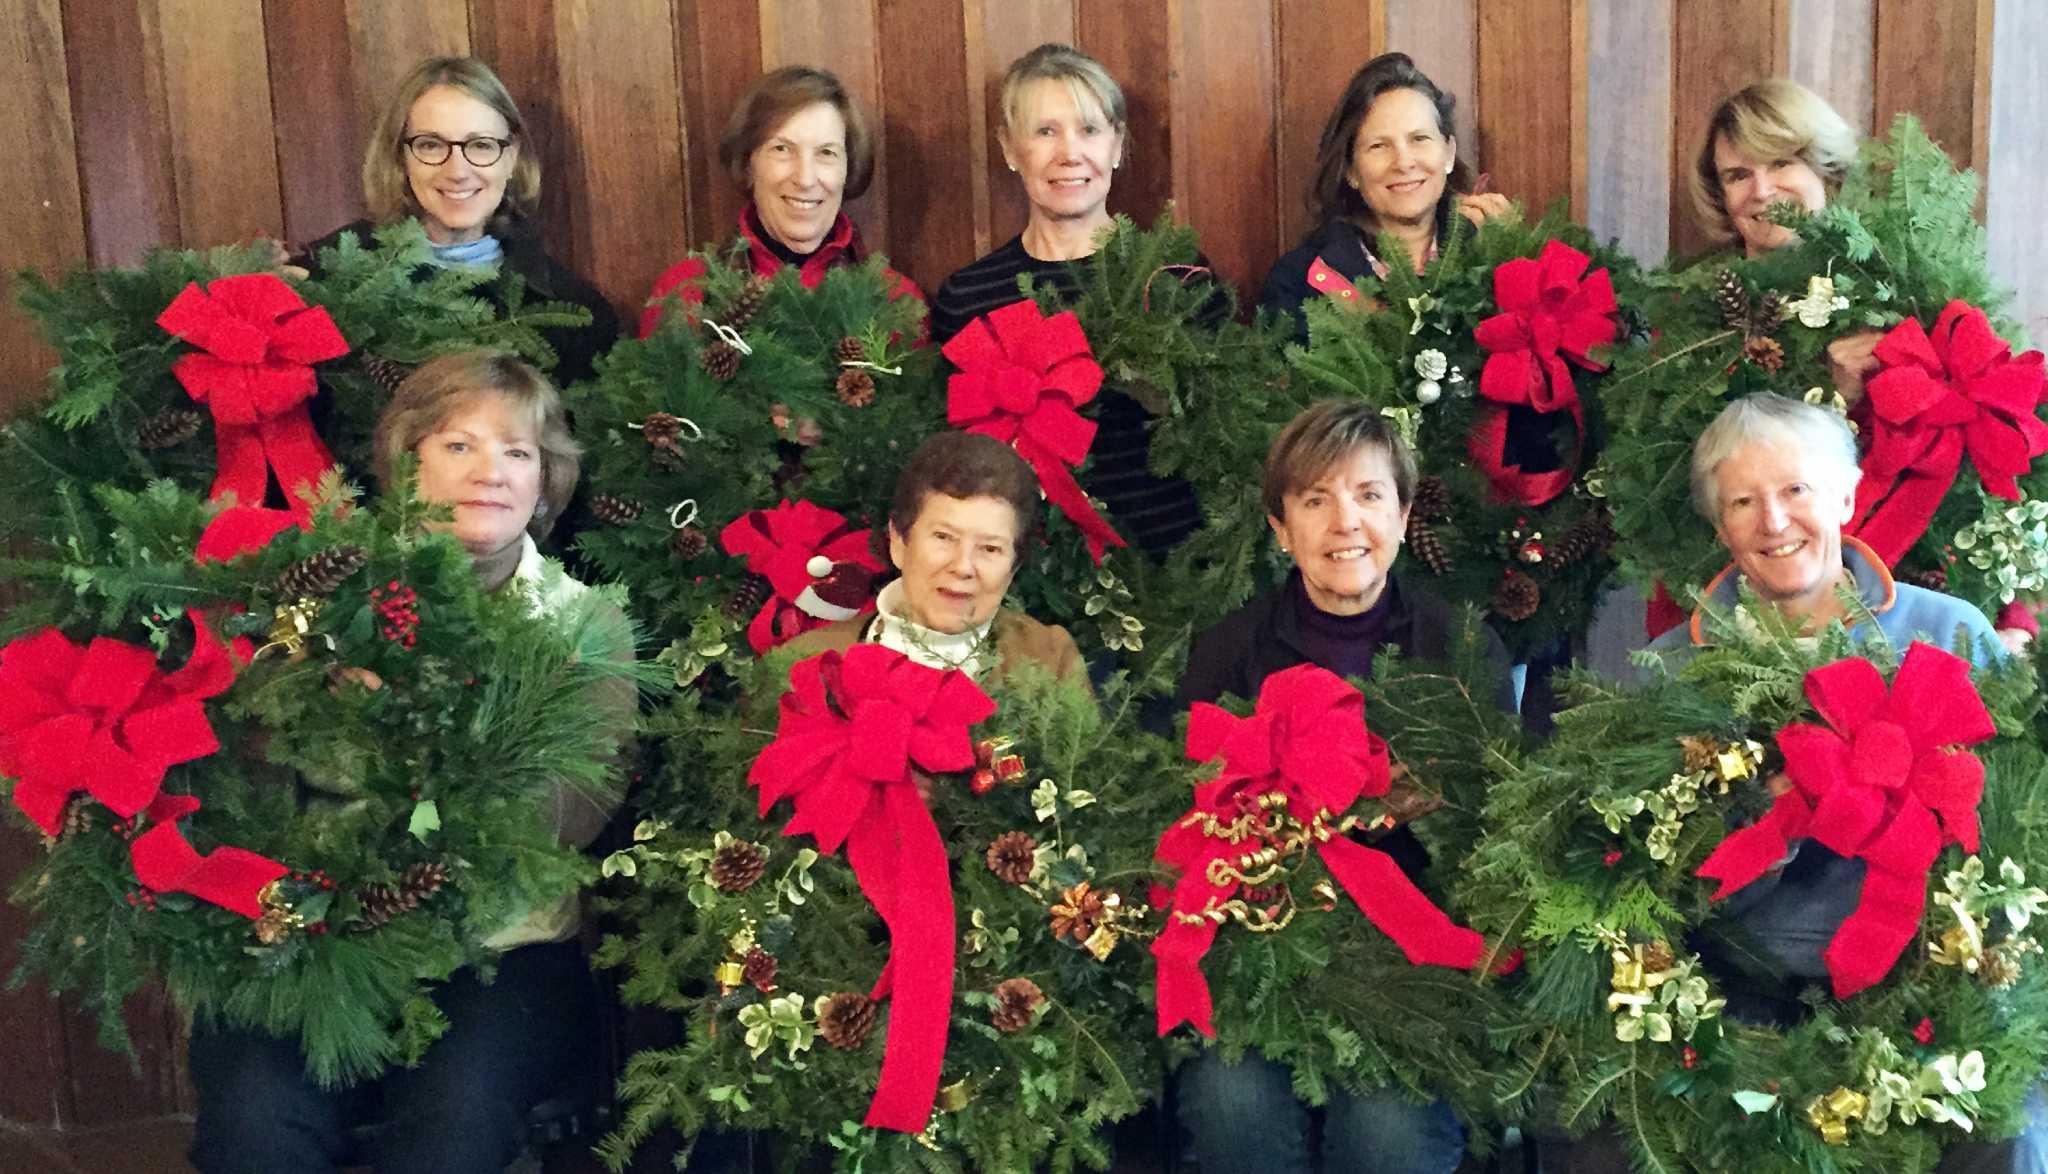 Garden Club Wreaths Spread Holiday Cheer Fairfield Citizen